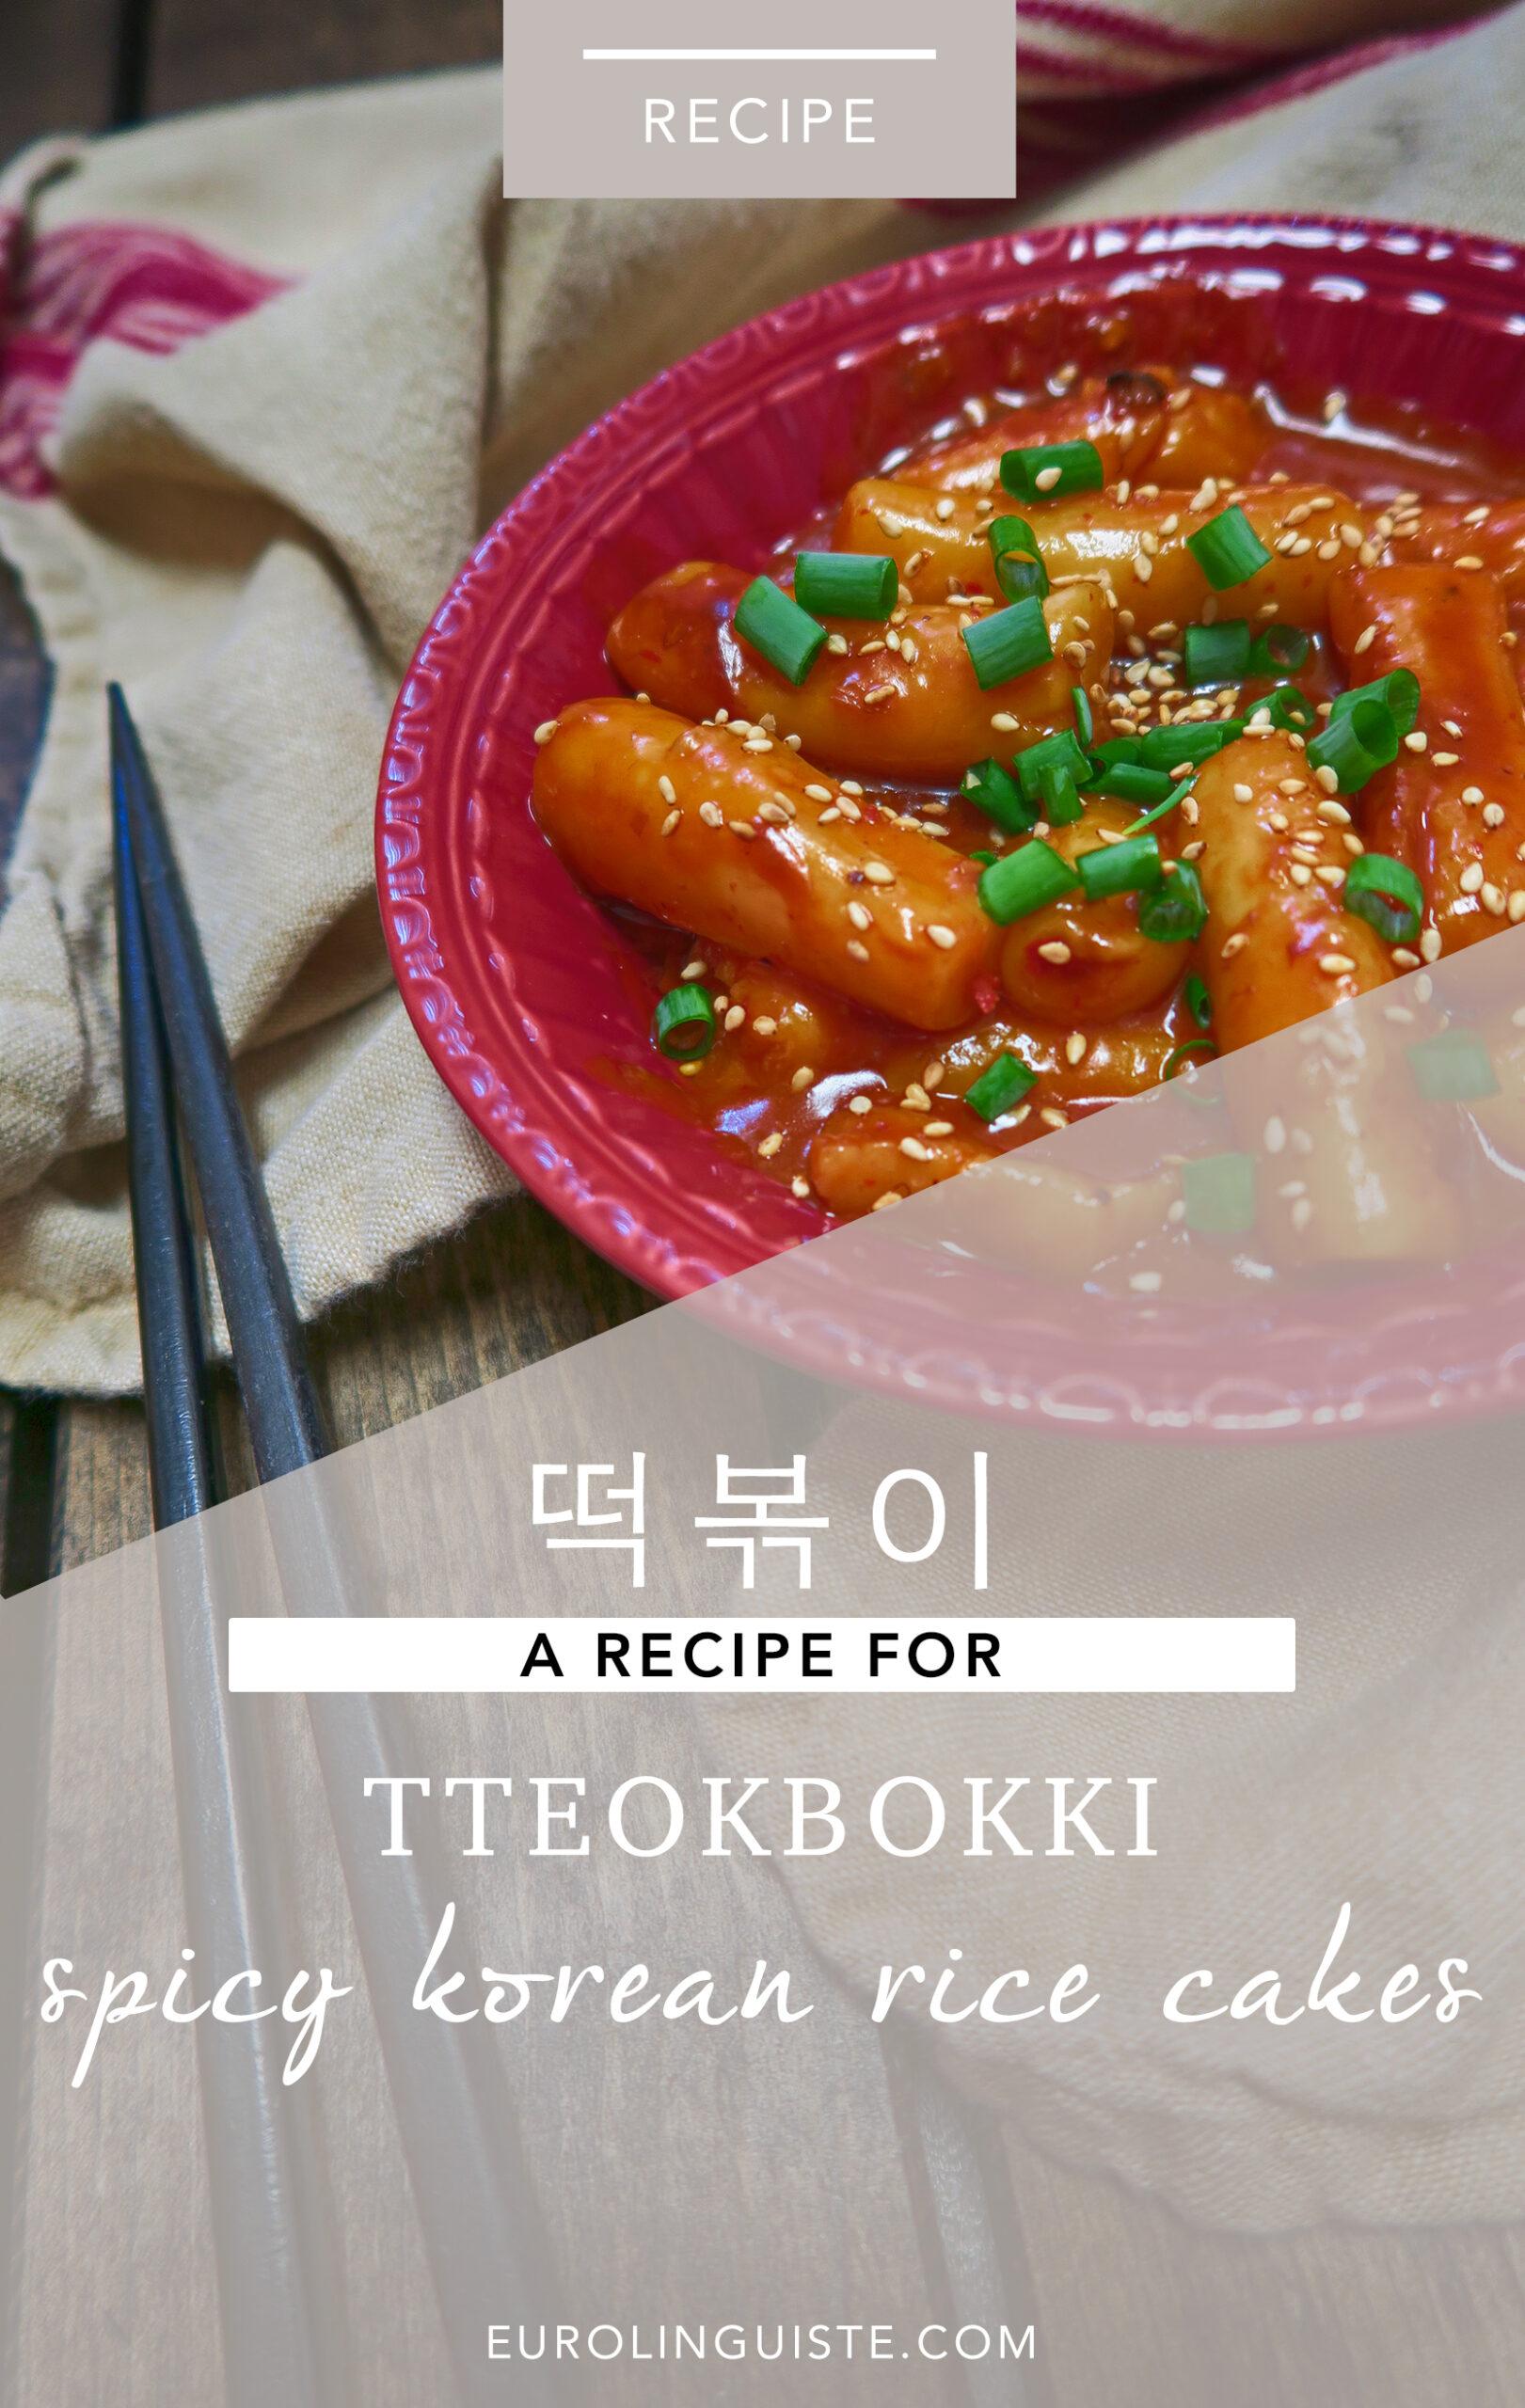 Korean Street Food Recipe Tteokbokki 떡볶이 Eurolinguiste